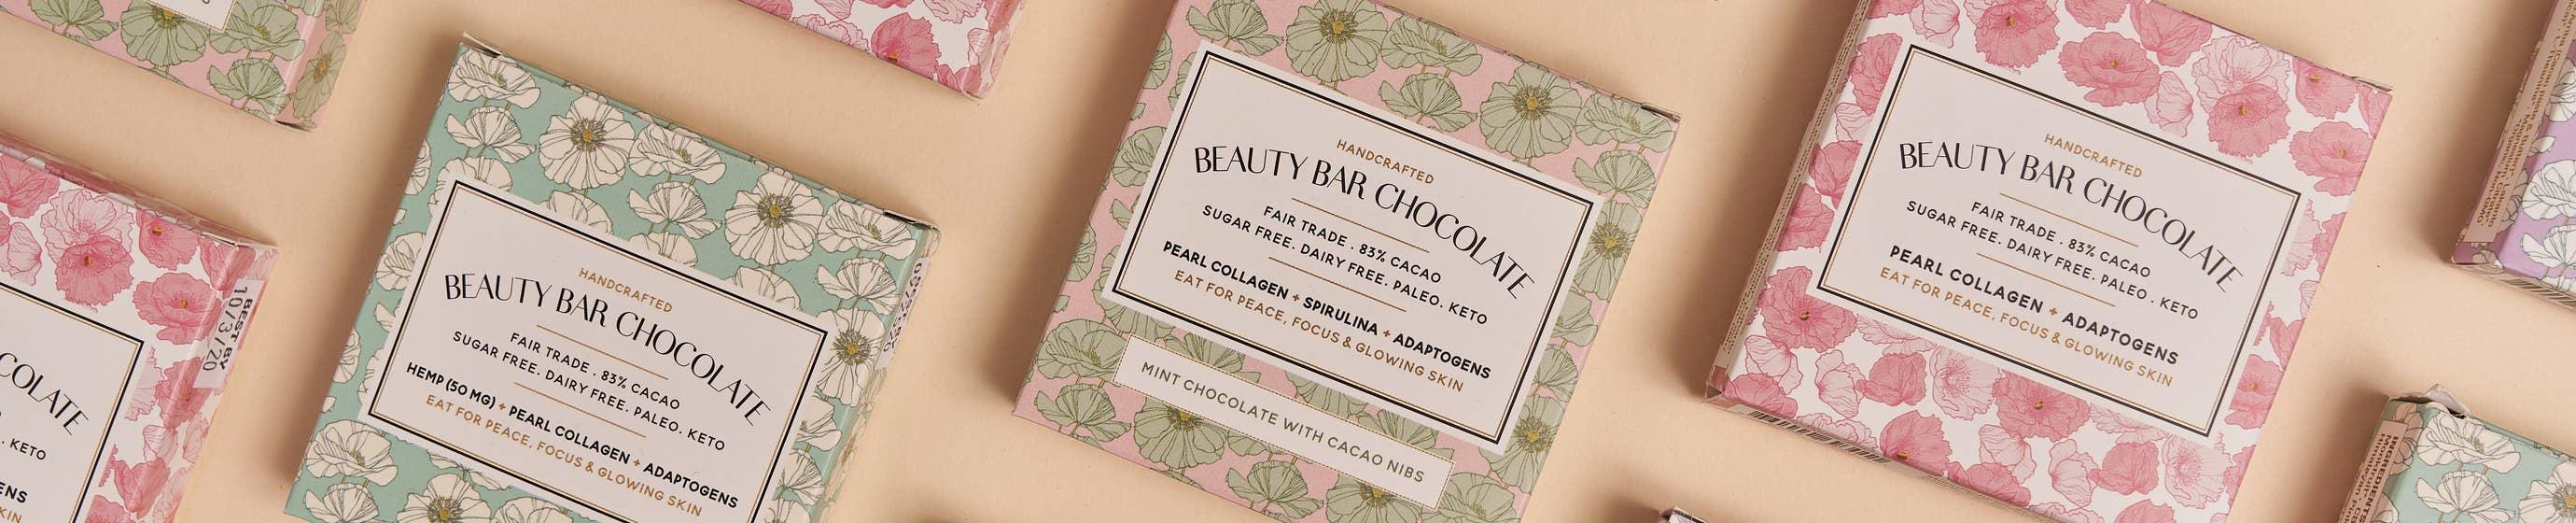 Beauty Bar Chocolate